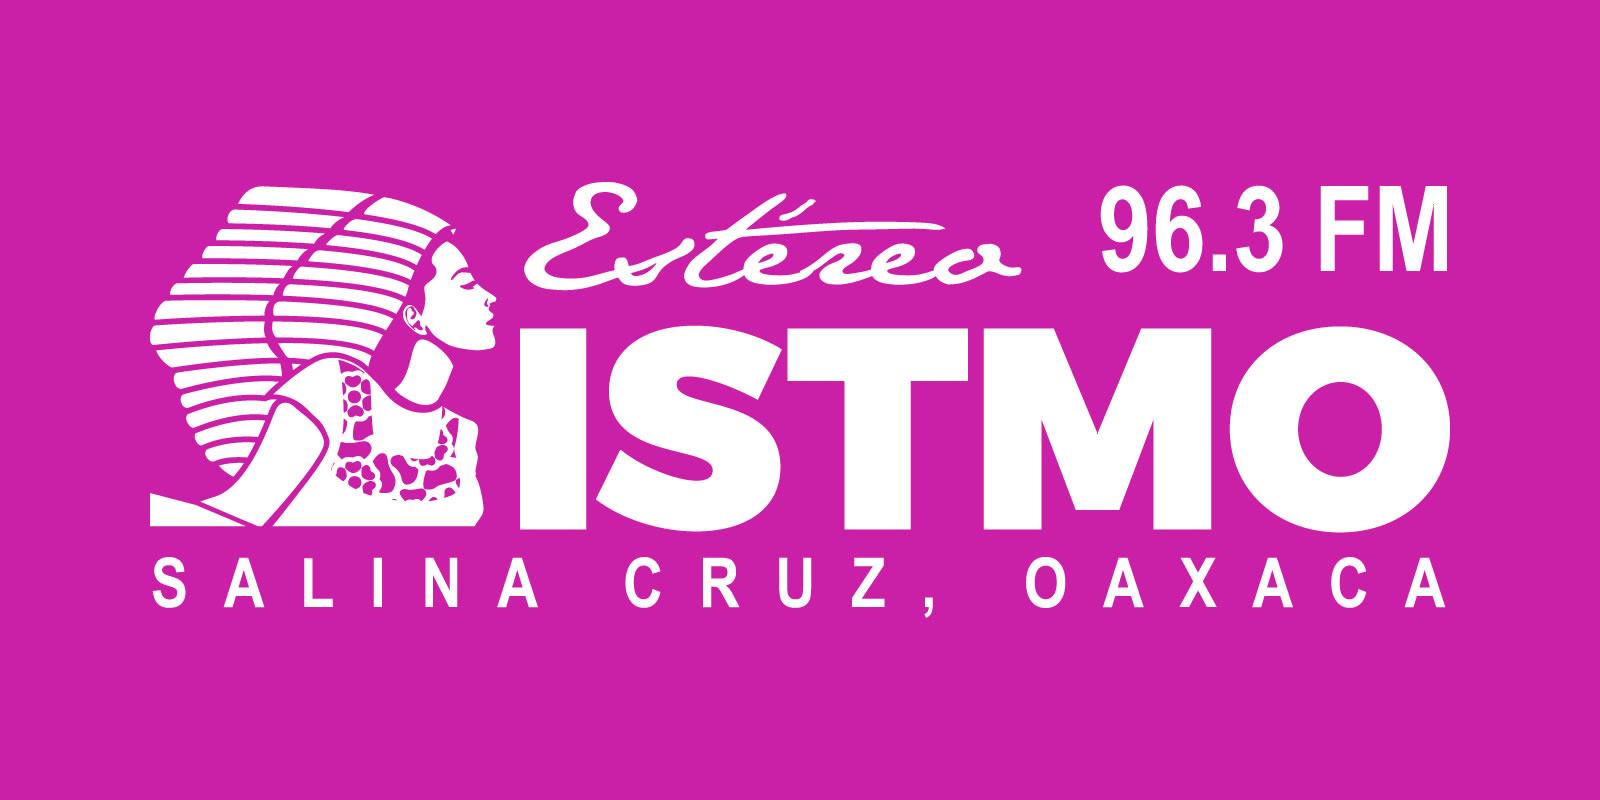 Estereo Istmo 96.3 FM, Salina Cruz, Oaxaca